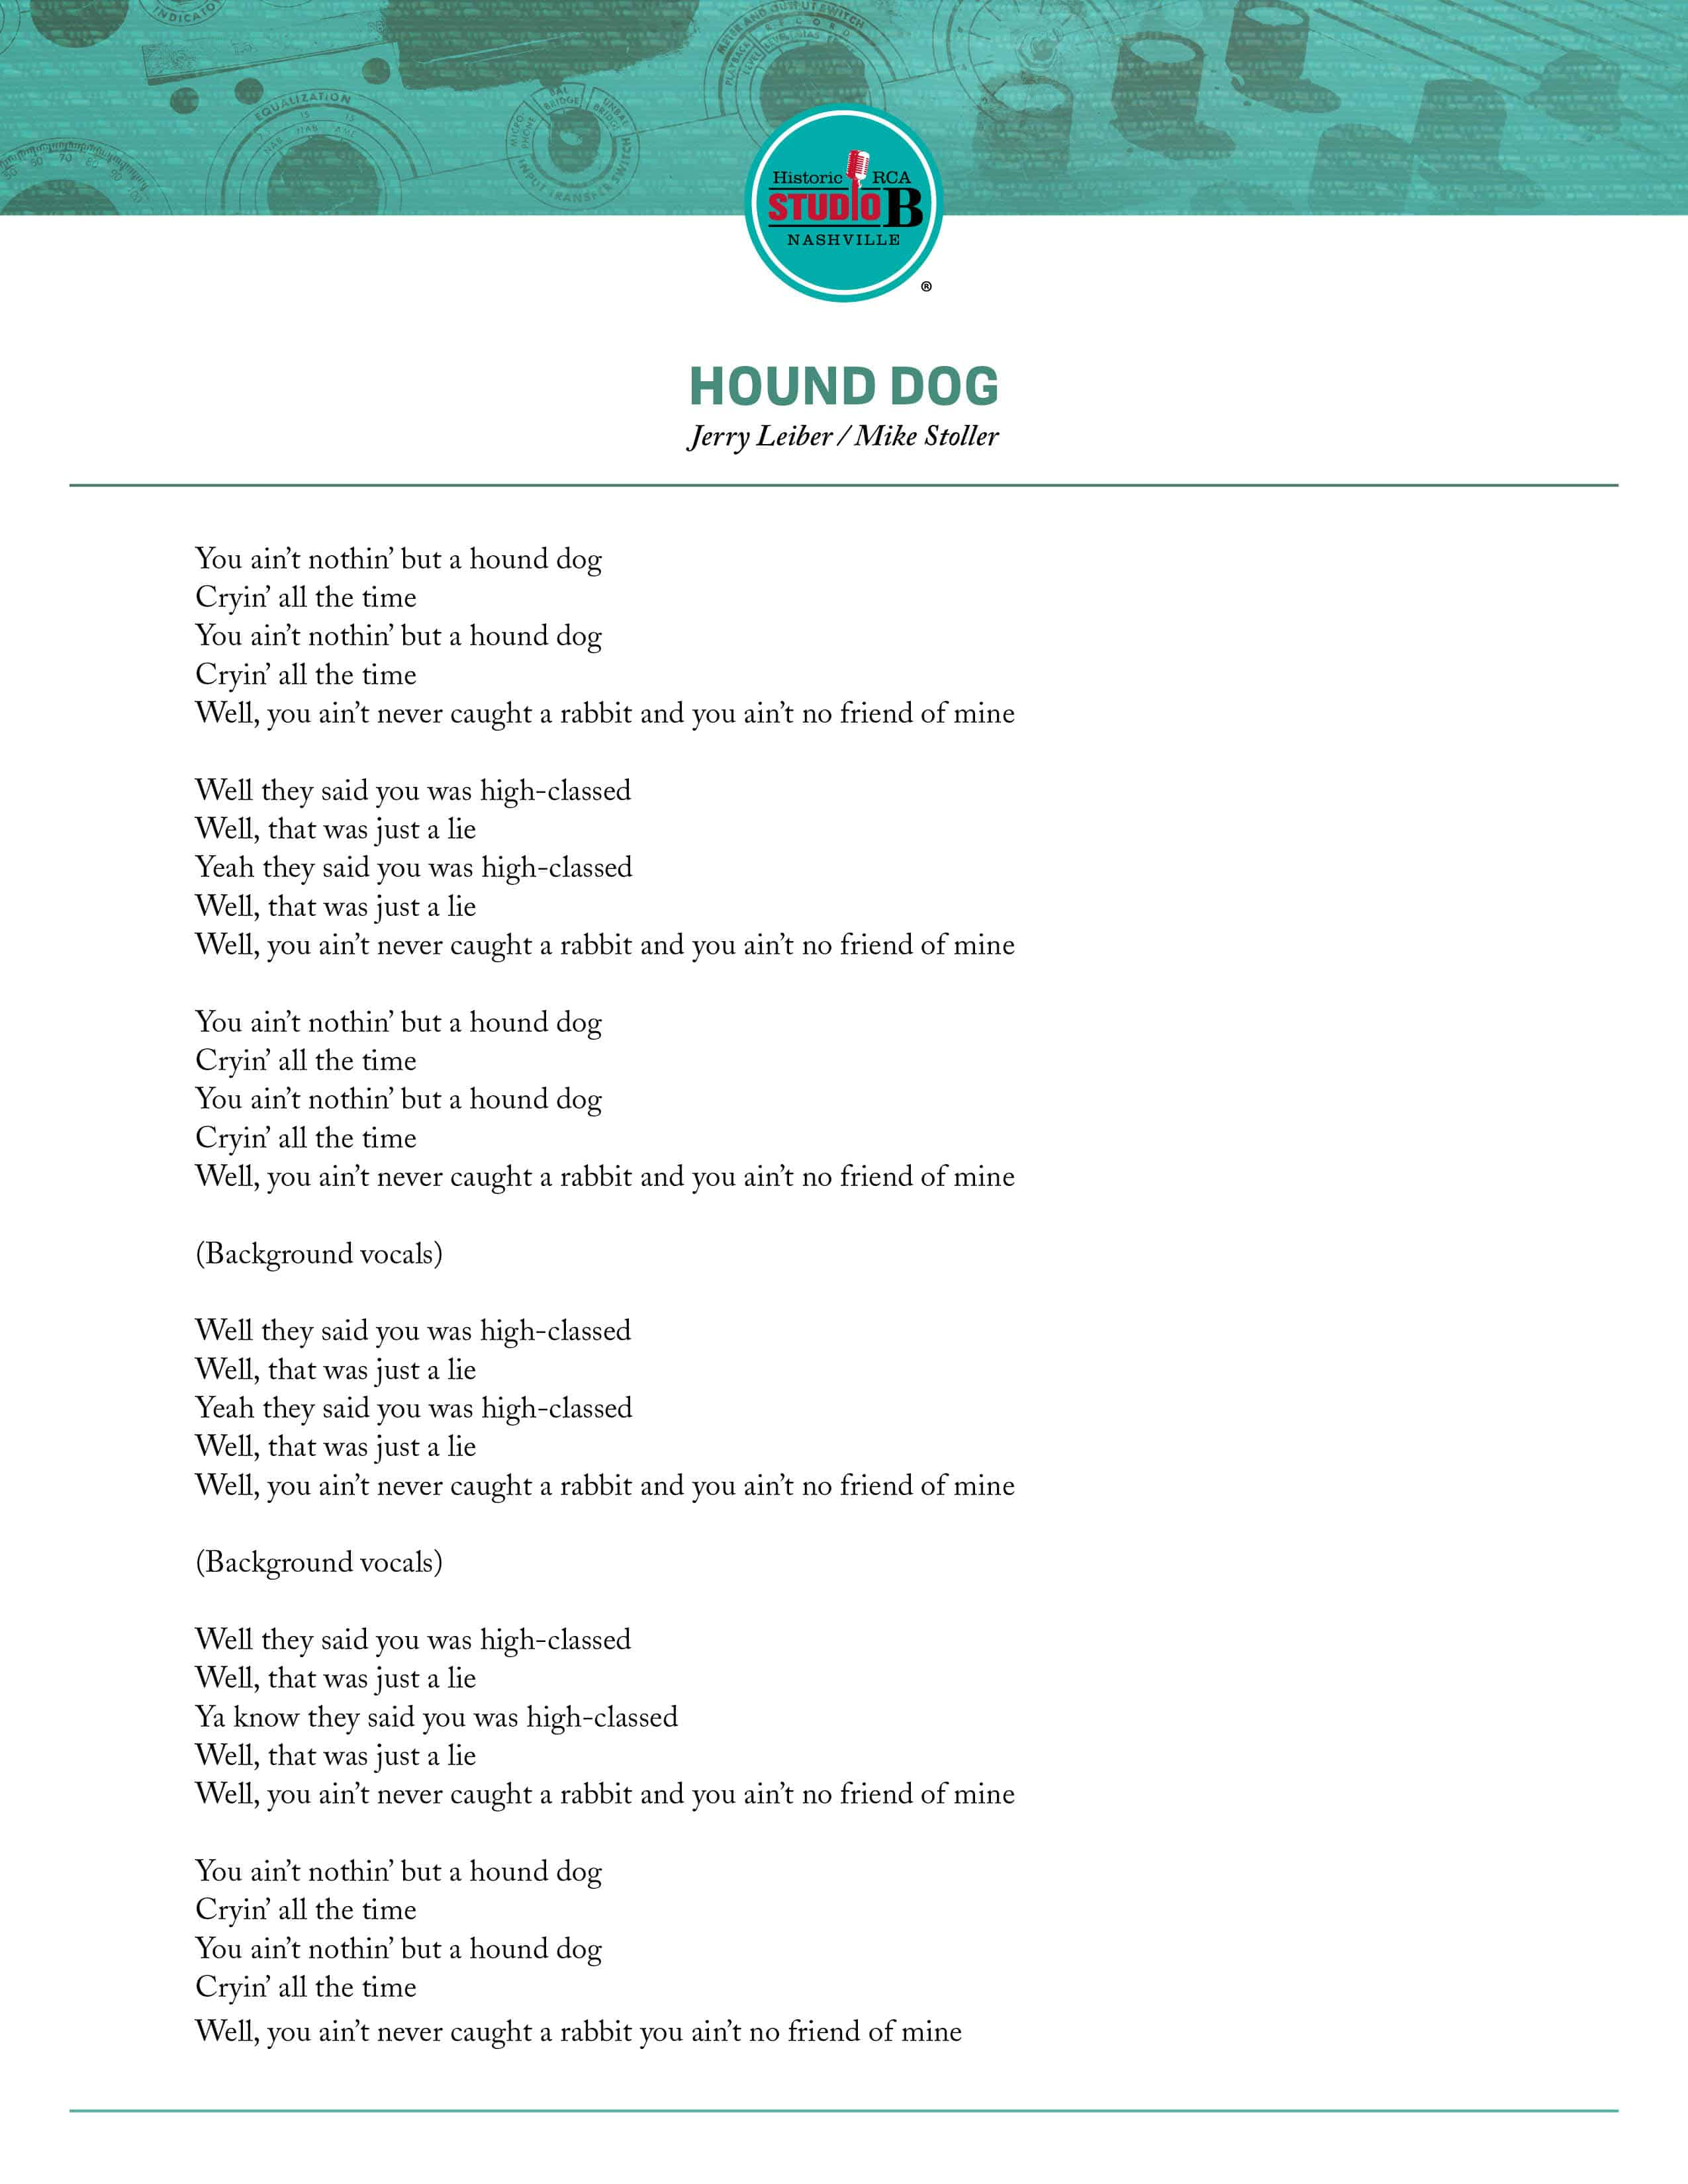 SCH_ElvisPresley_Portal_Lyrics-Bio_18_3